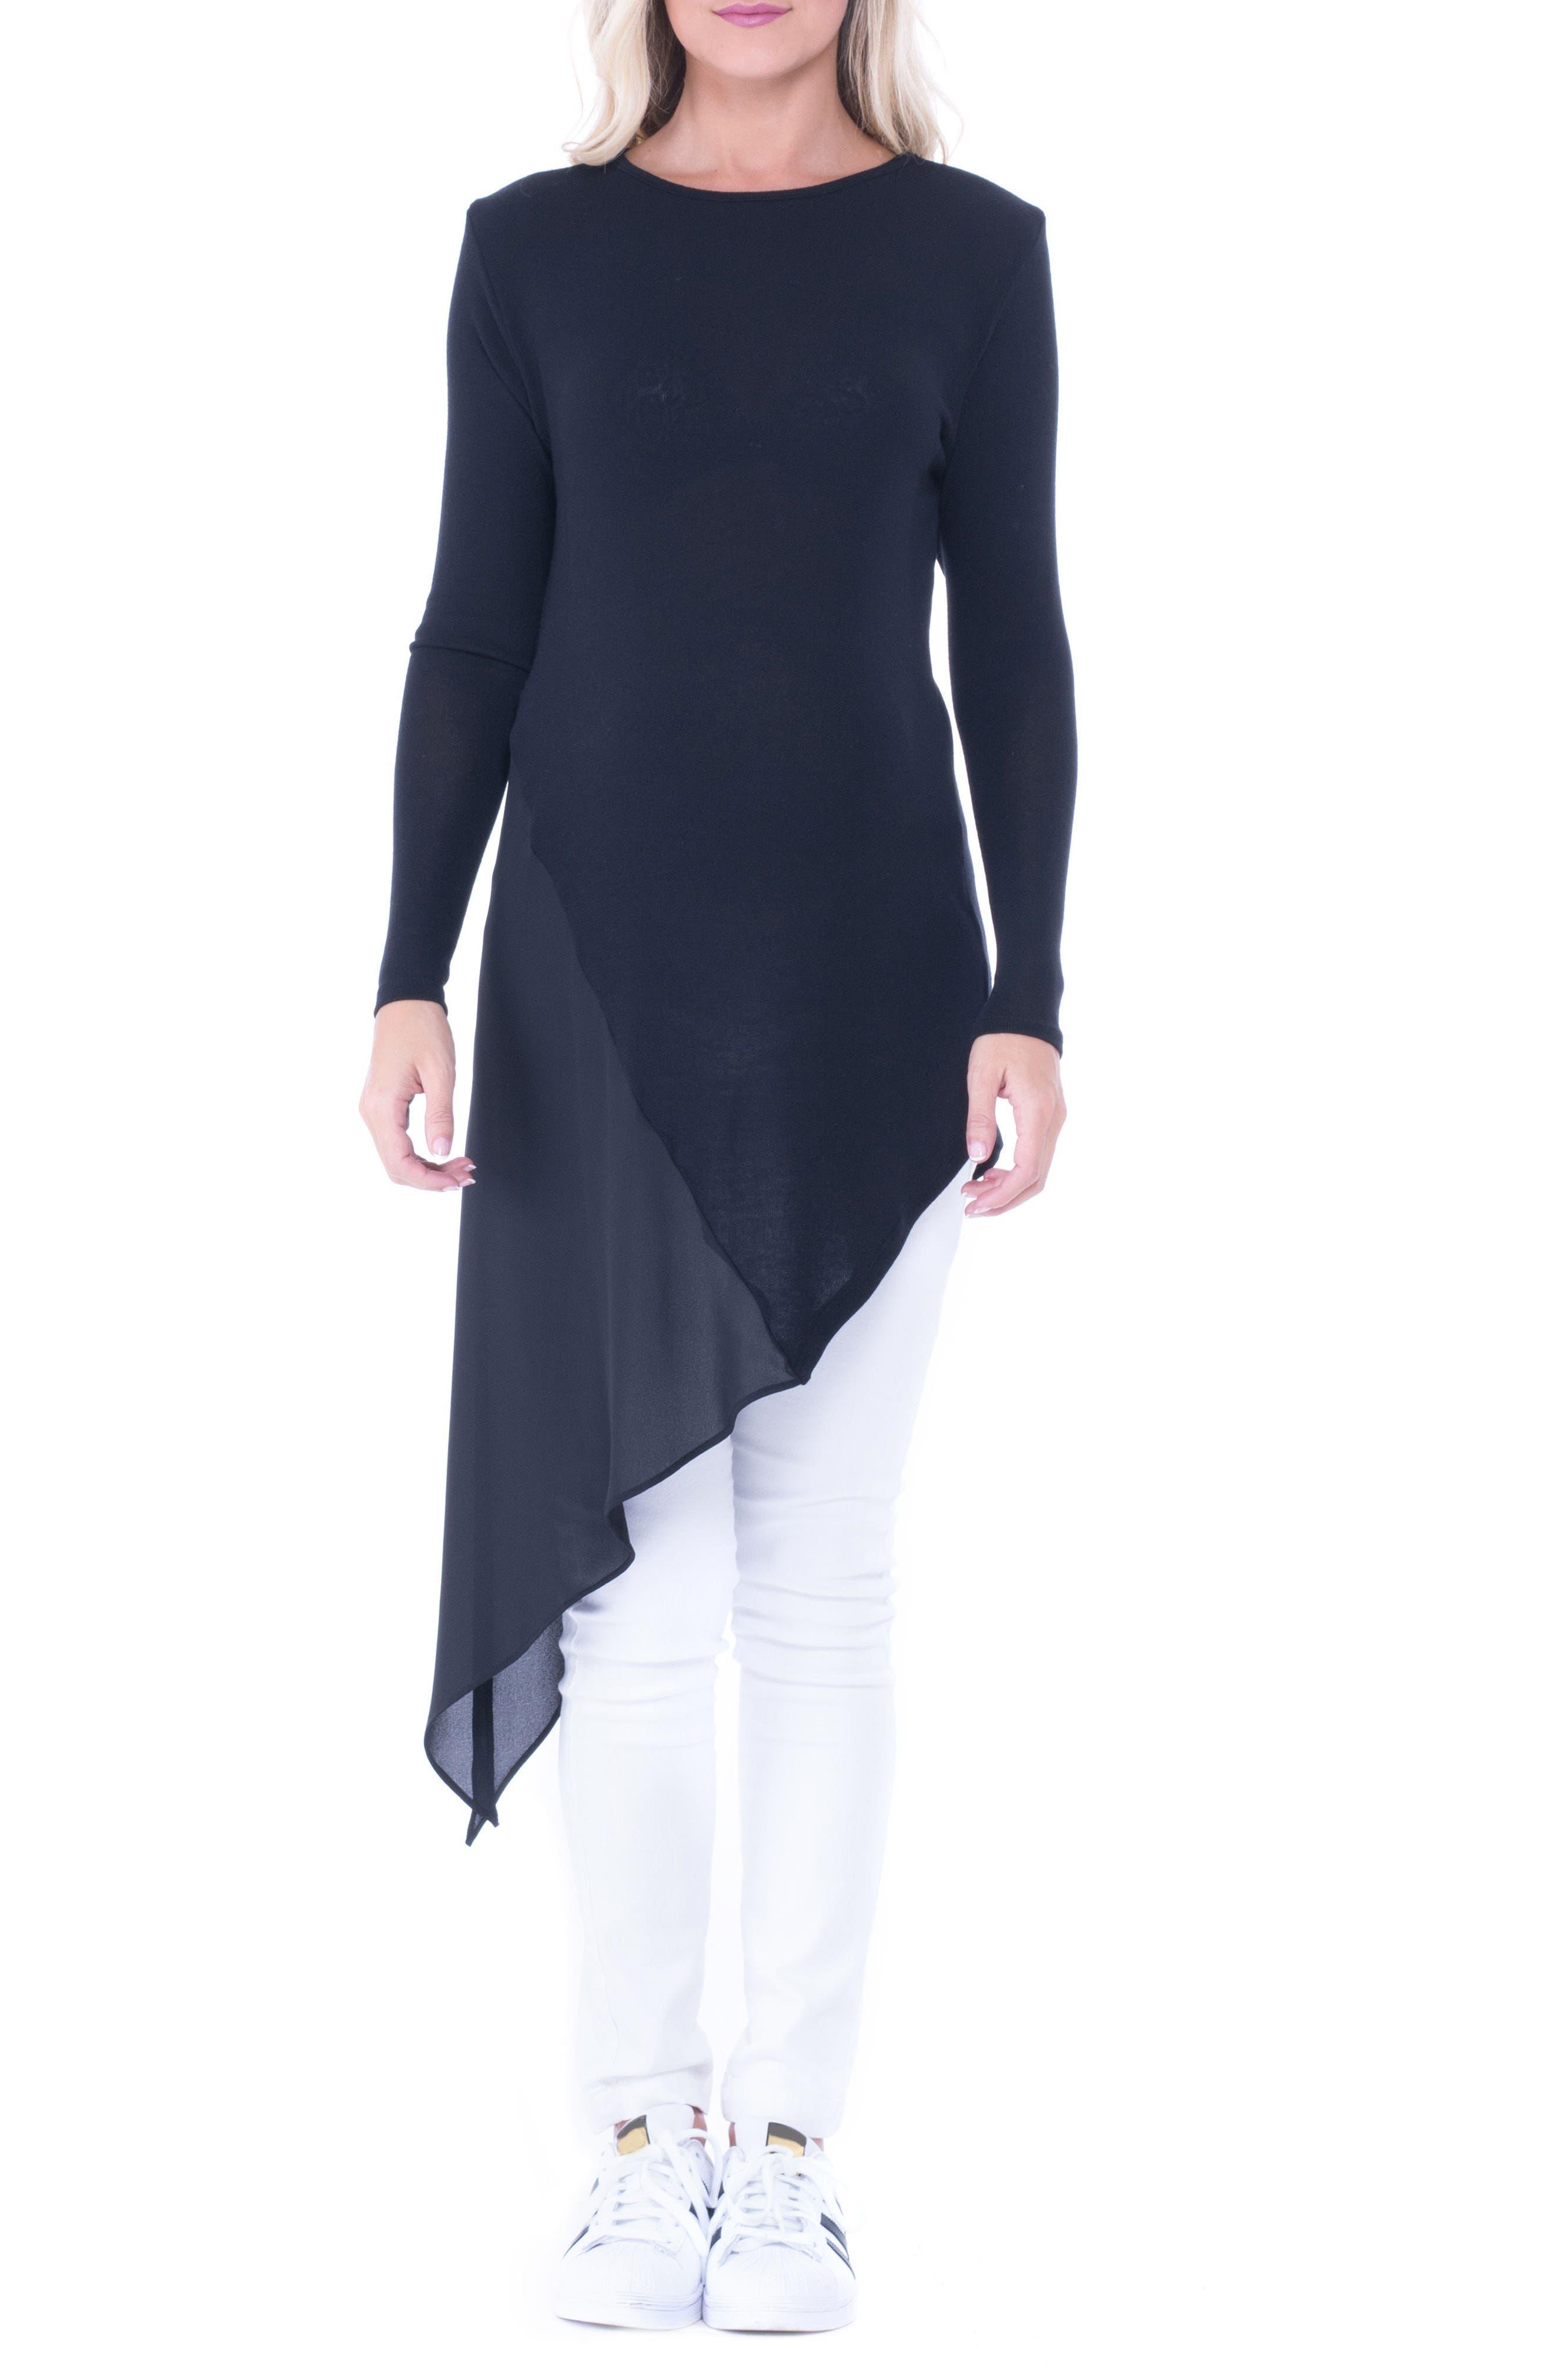 Leah Side Tie Maternity Top,                         Main,                         color, Black